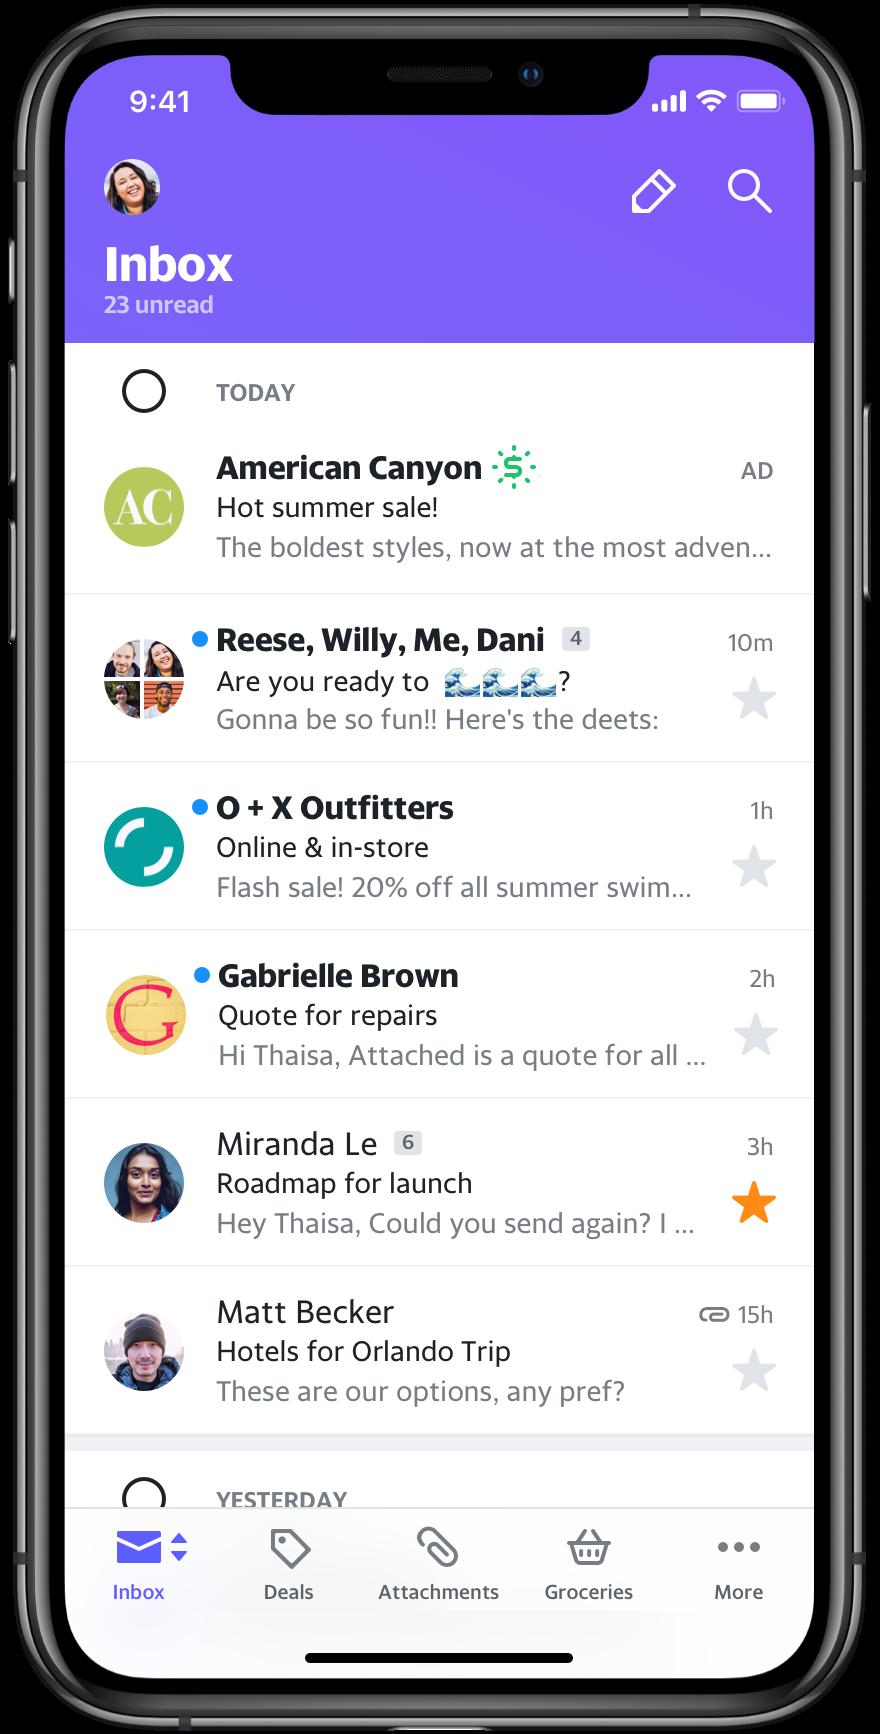 Yahoo Mail iOS Inbox